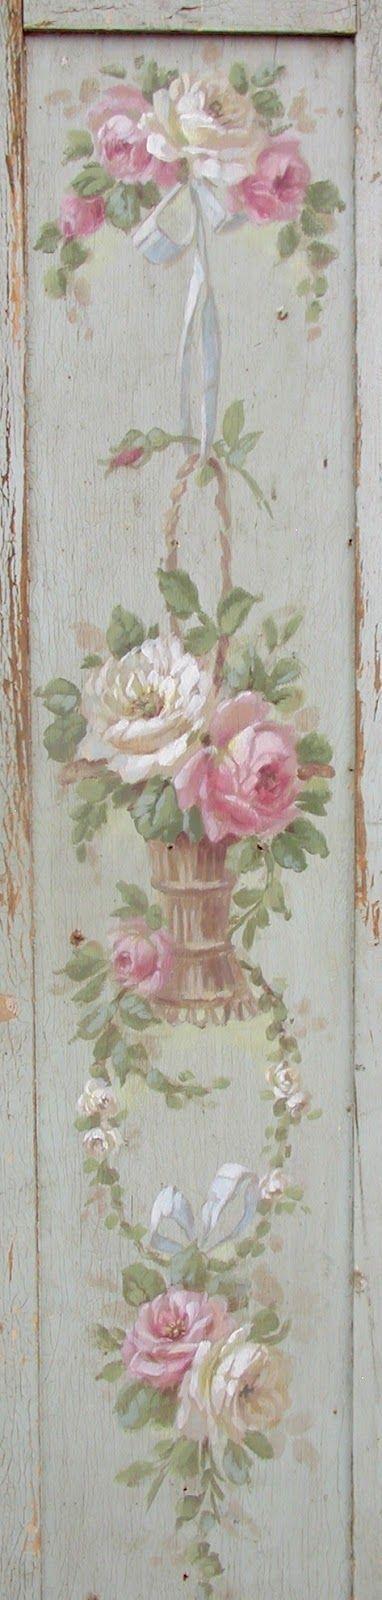 Frivolous Fabulous - French Pink Roses and Basket Frivolous Fabulous Warm and Cozy